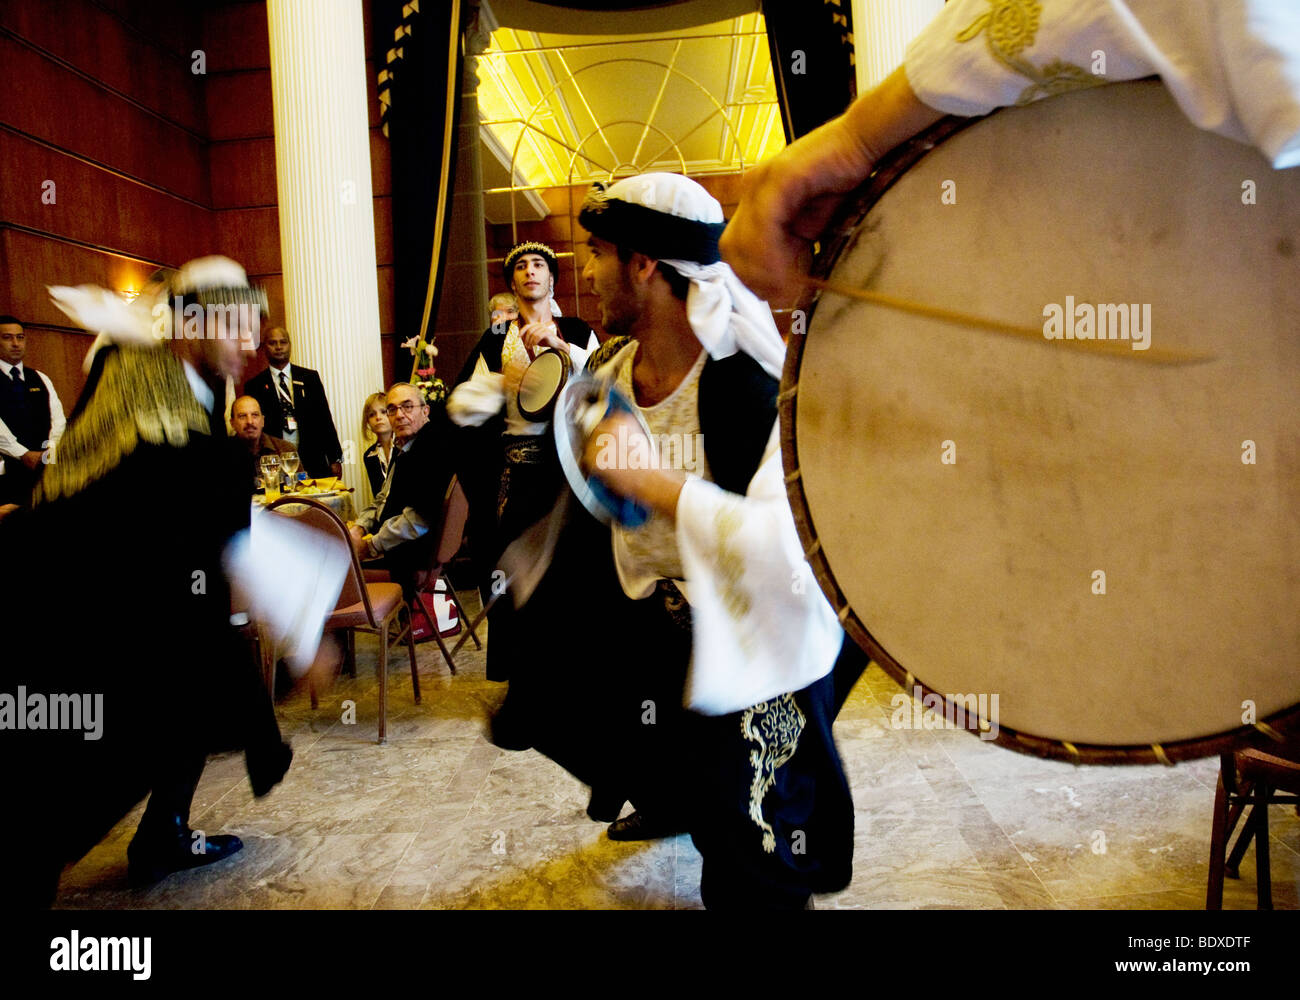 Lebanese Music Stock Photos & Lebanese Music Stock Images - Alamy